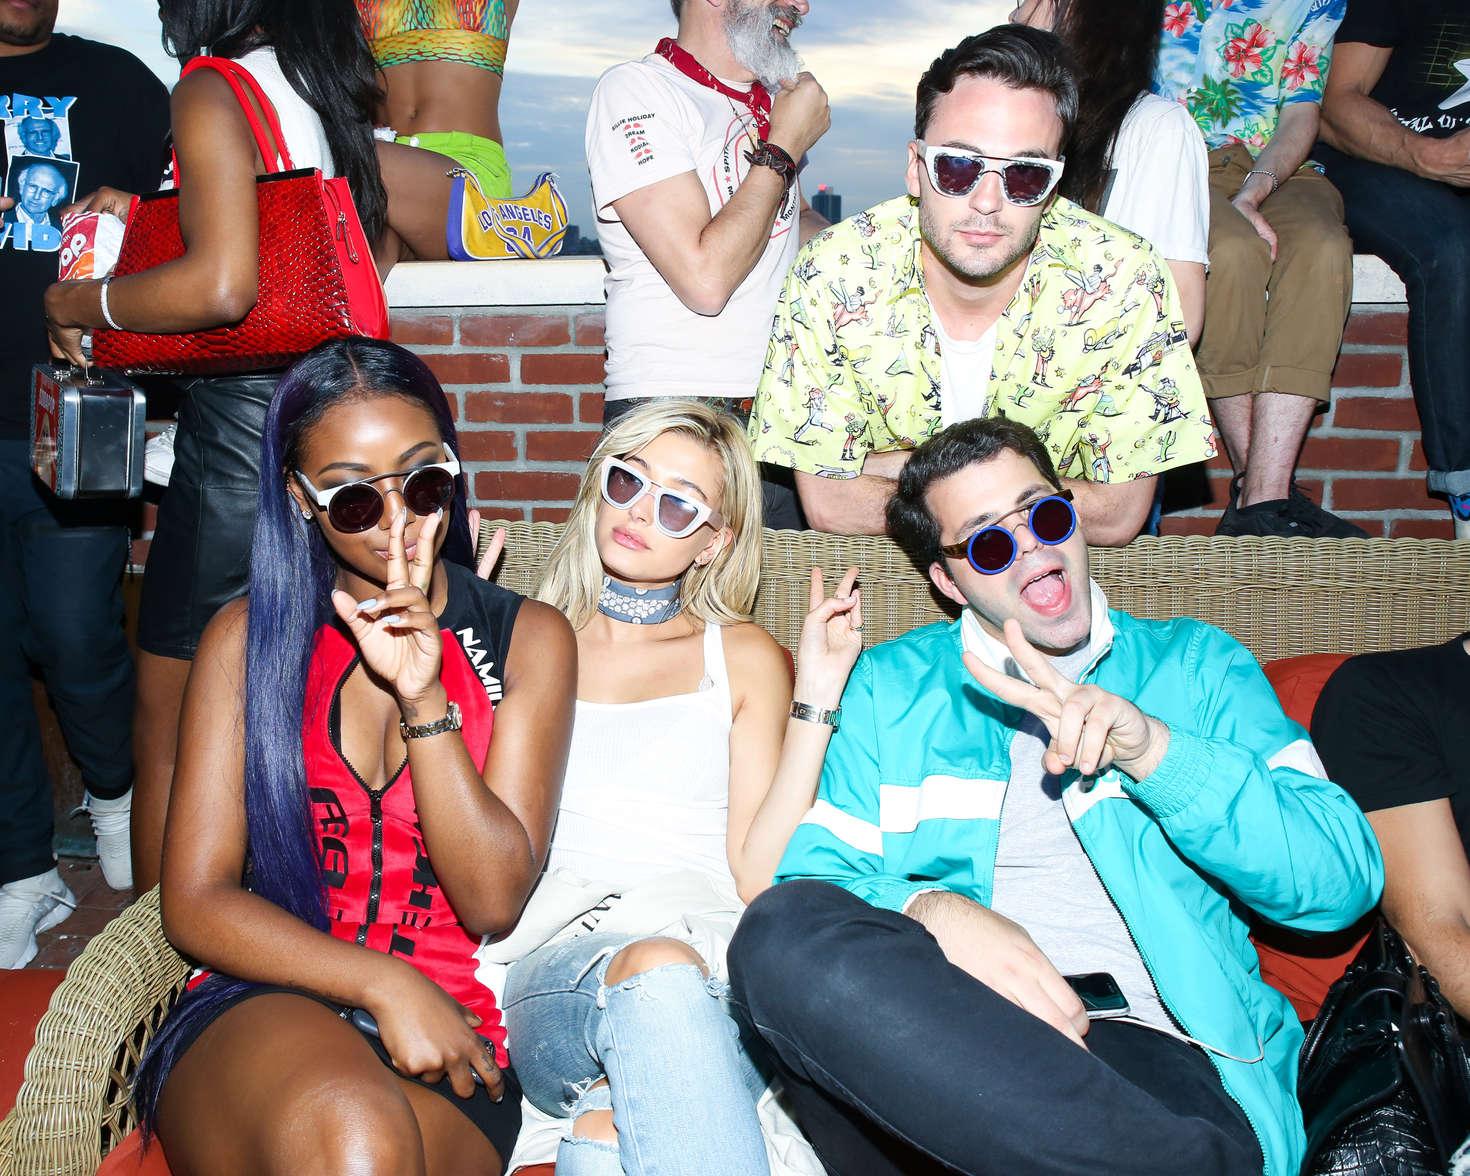 002bfa4eaf Hailey Baldwin  Smoke X Mirrors Presents Sodapop With Justine Skye ...